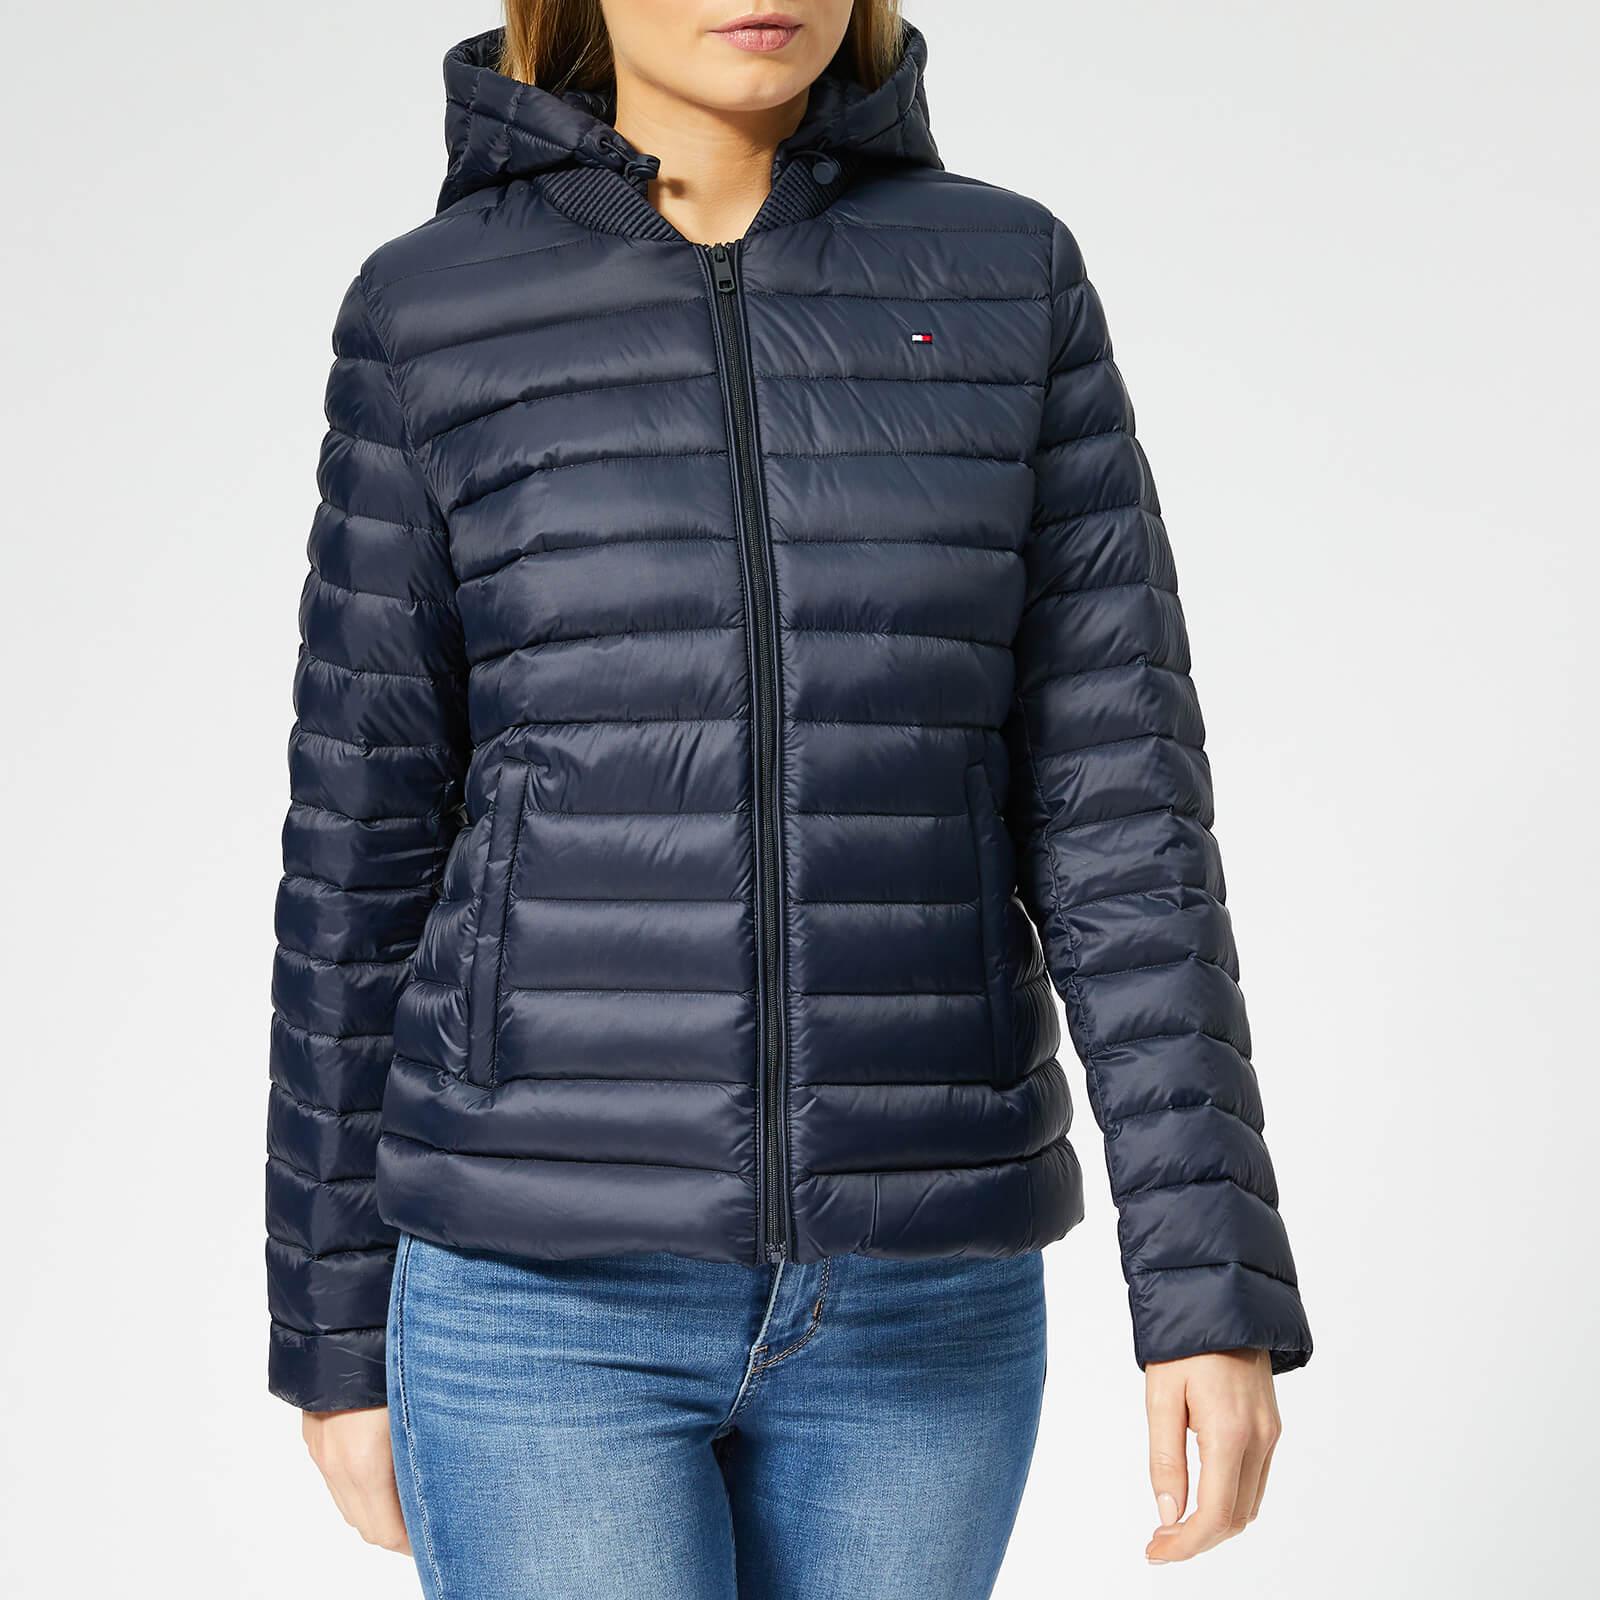 2b7558bda Tommy Hilfiger Women's Essential Down Packable Jacket - Midnight